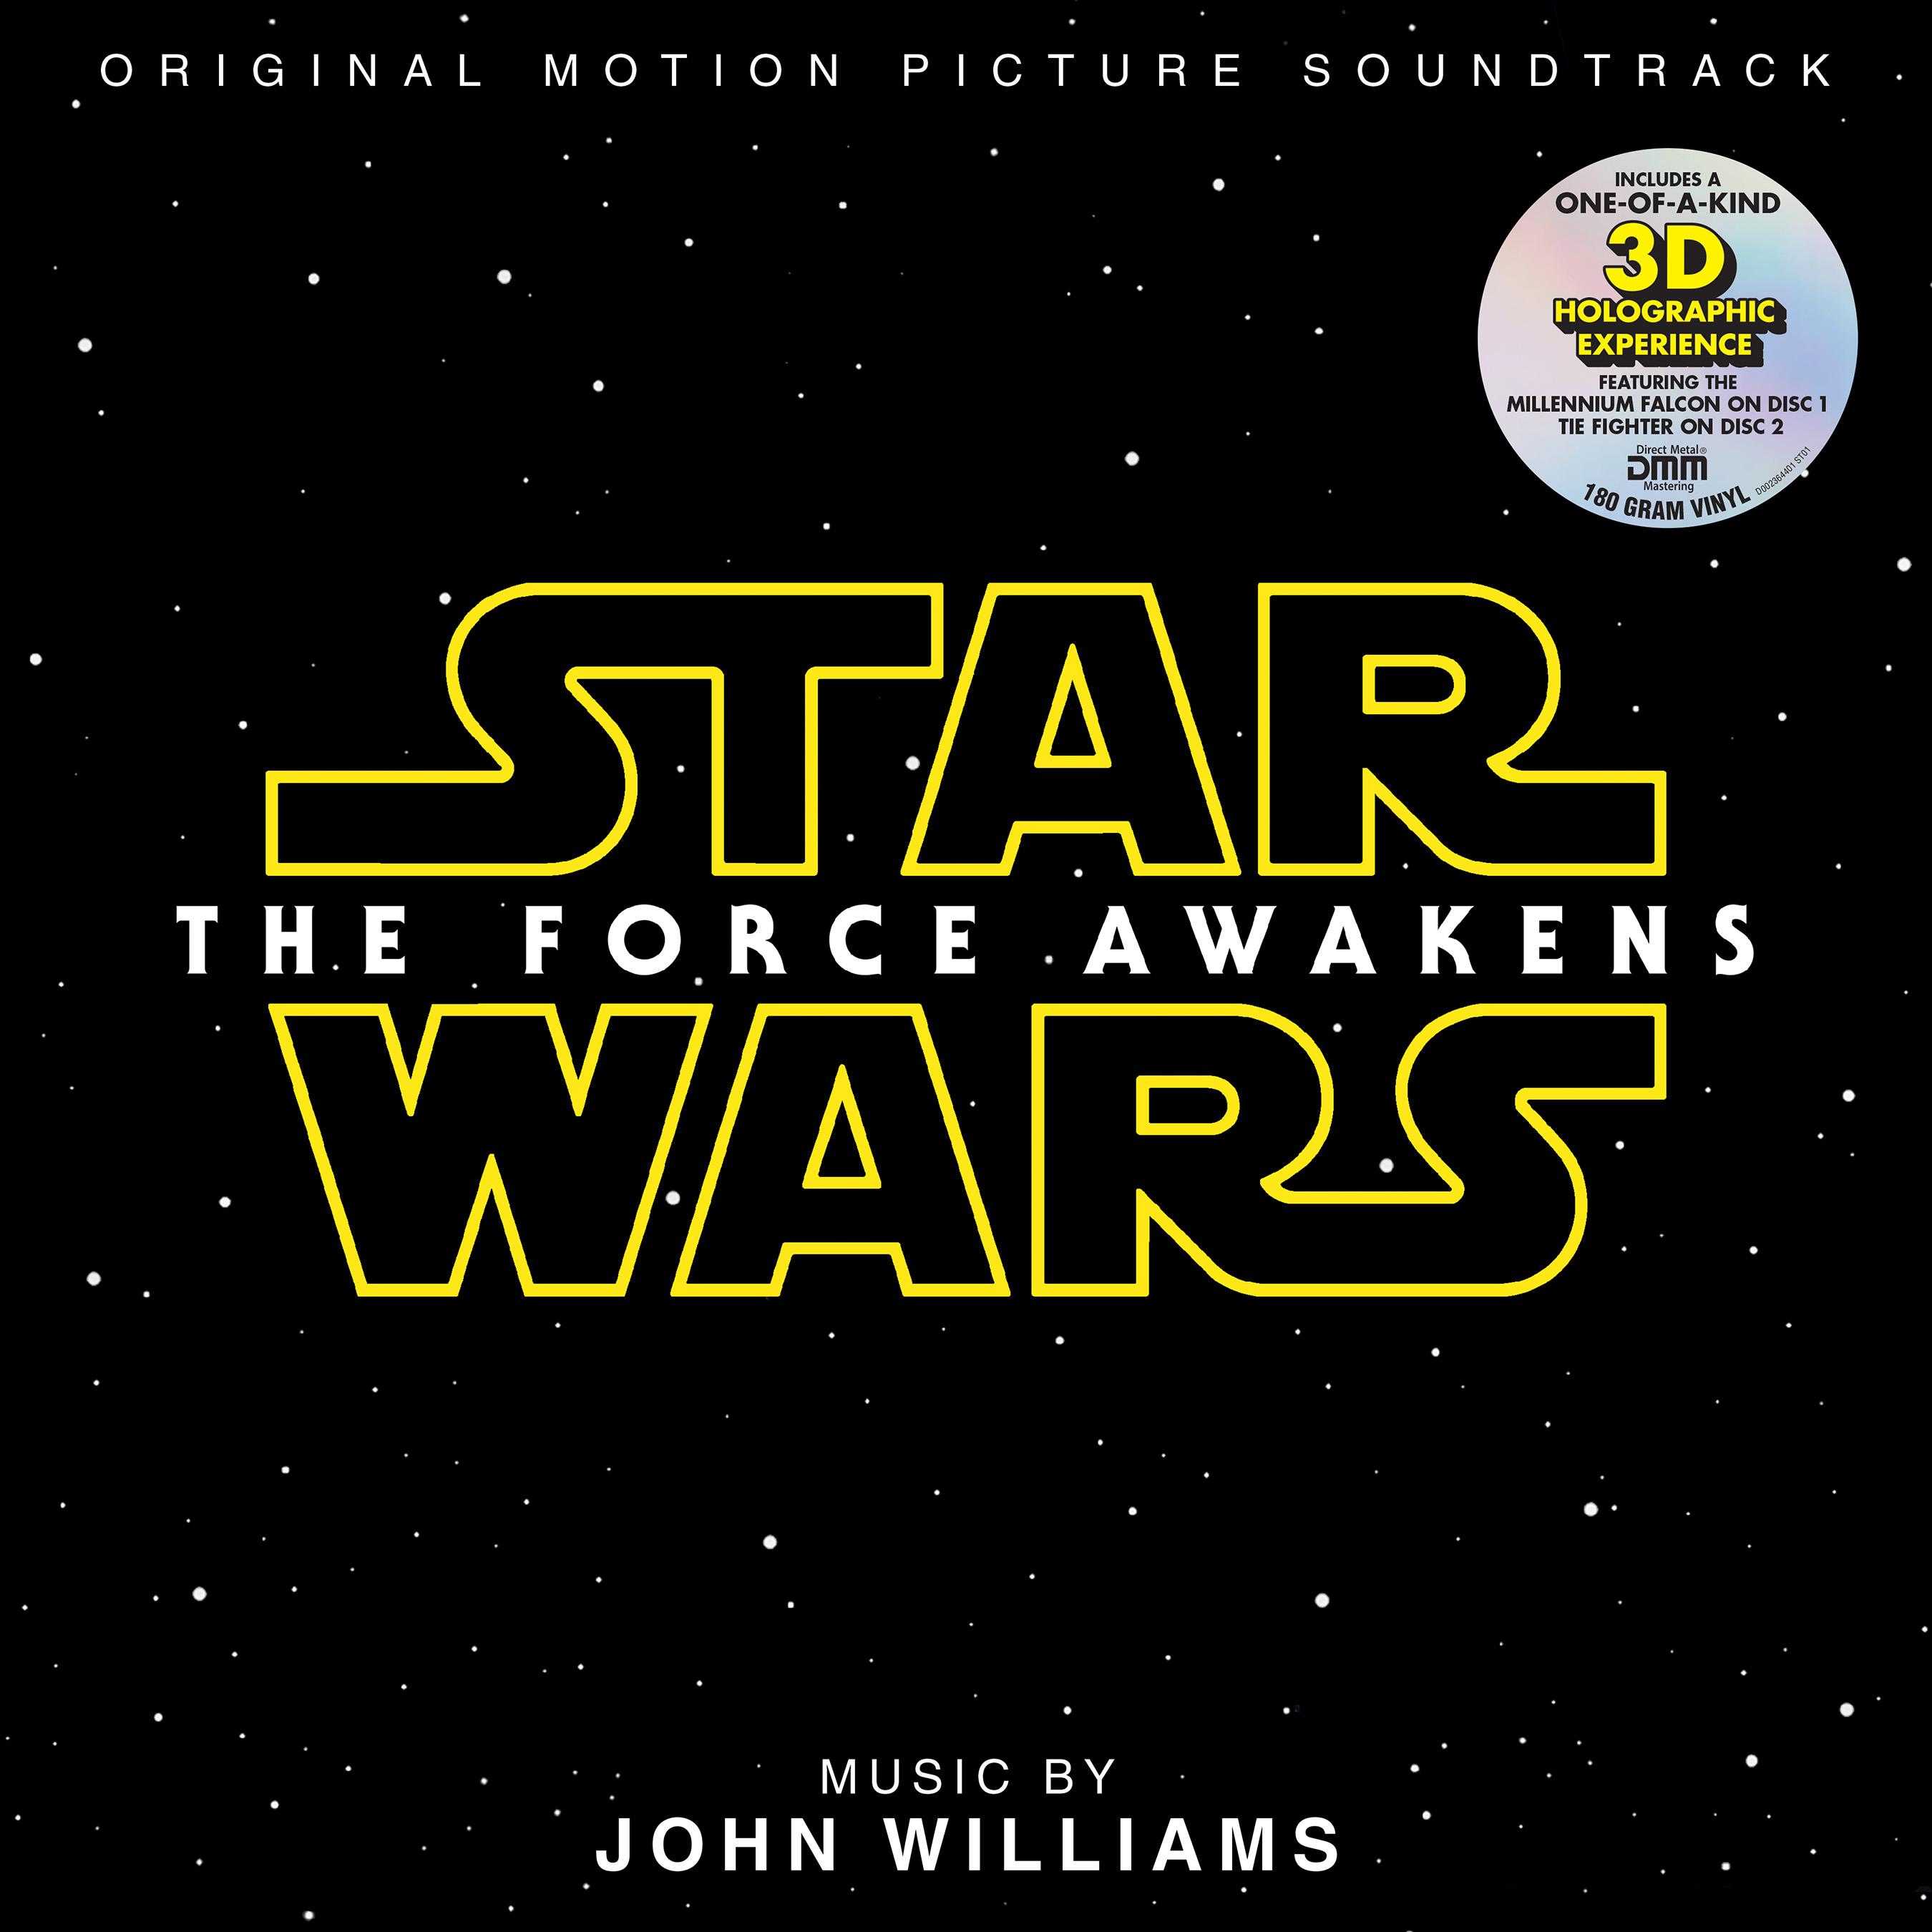 Star Wars: The Force Awakens Soundtrack 2 LP Hologram Vinyl with Sticker